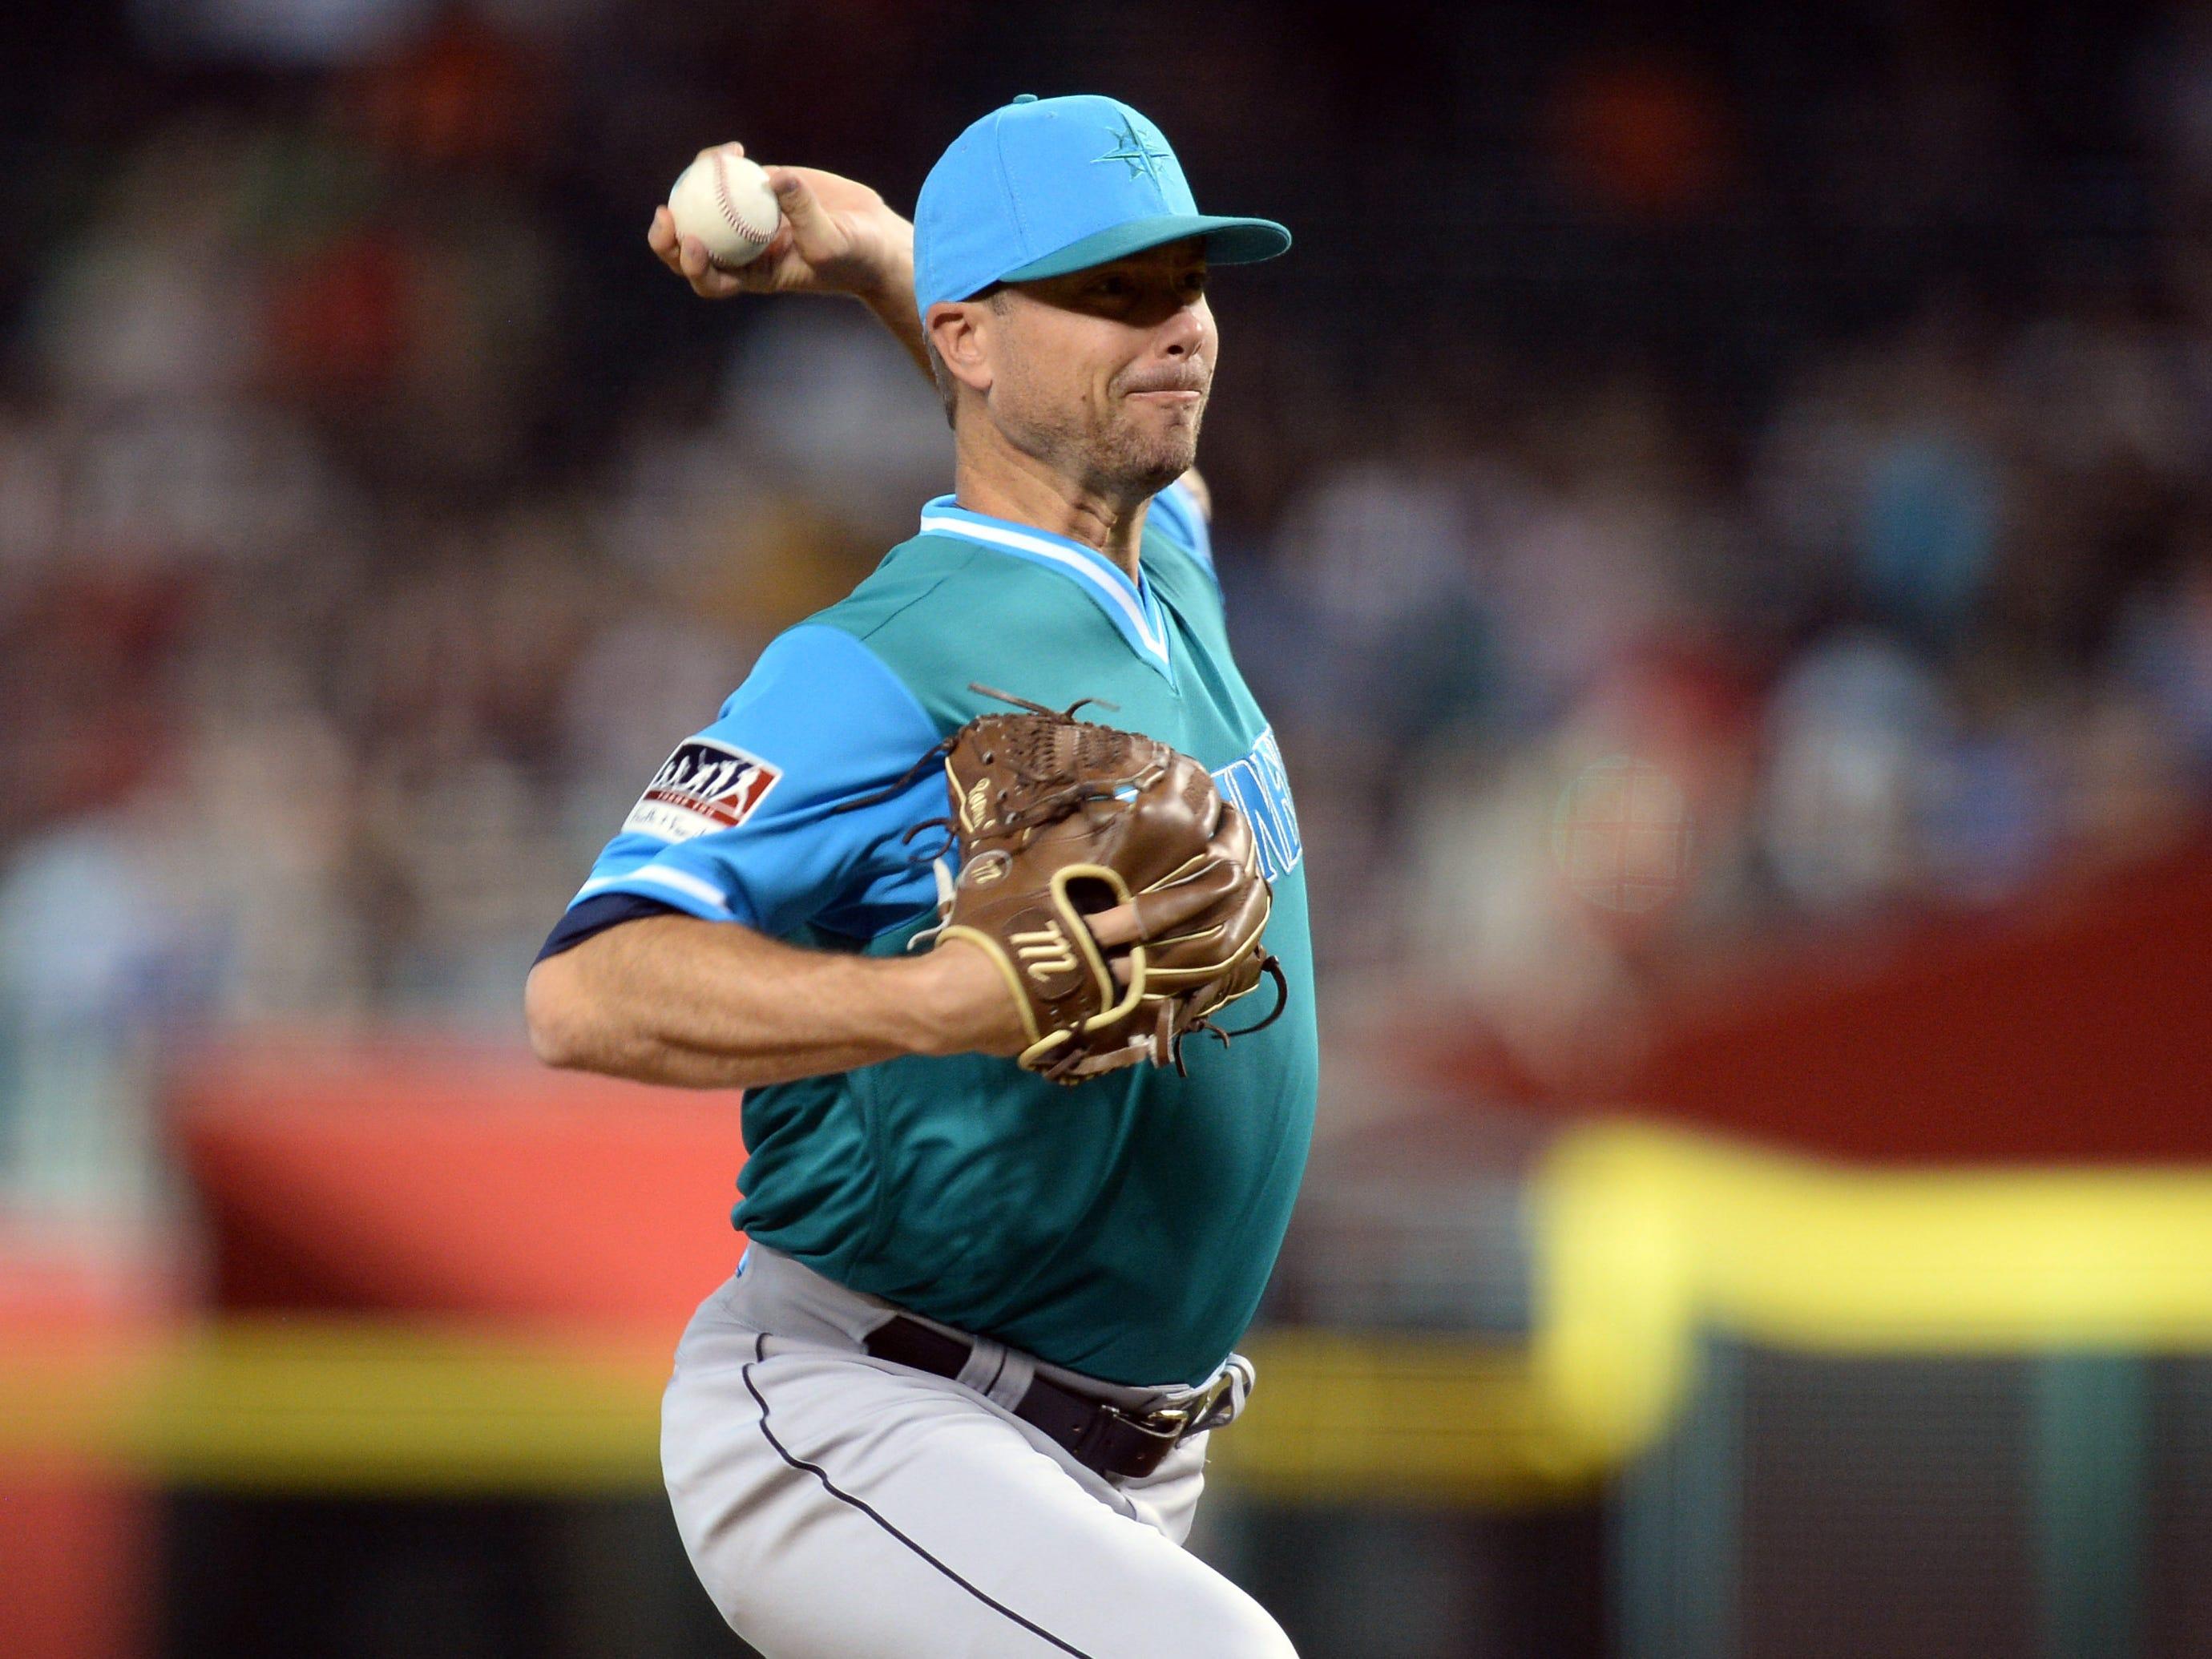 Aug 25, 2018; Phoenix, AZ, USA; Seattle Mariners starting pitcher Wade LeBlanc (49) pitches against the Arizona Diamondbacks during the first inning at Chase Field. Mandatory Credit: Joe Camporeale-USA TODAY Sports